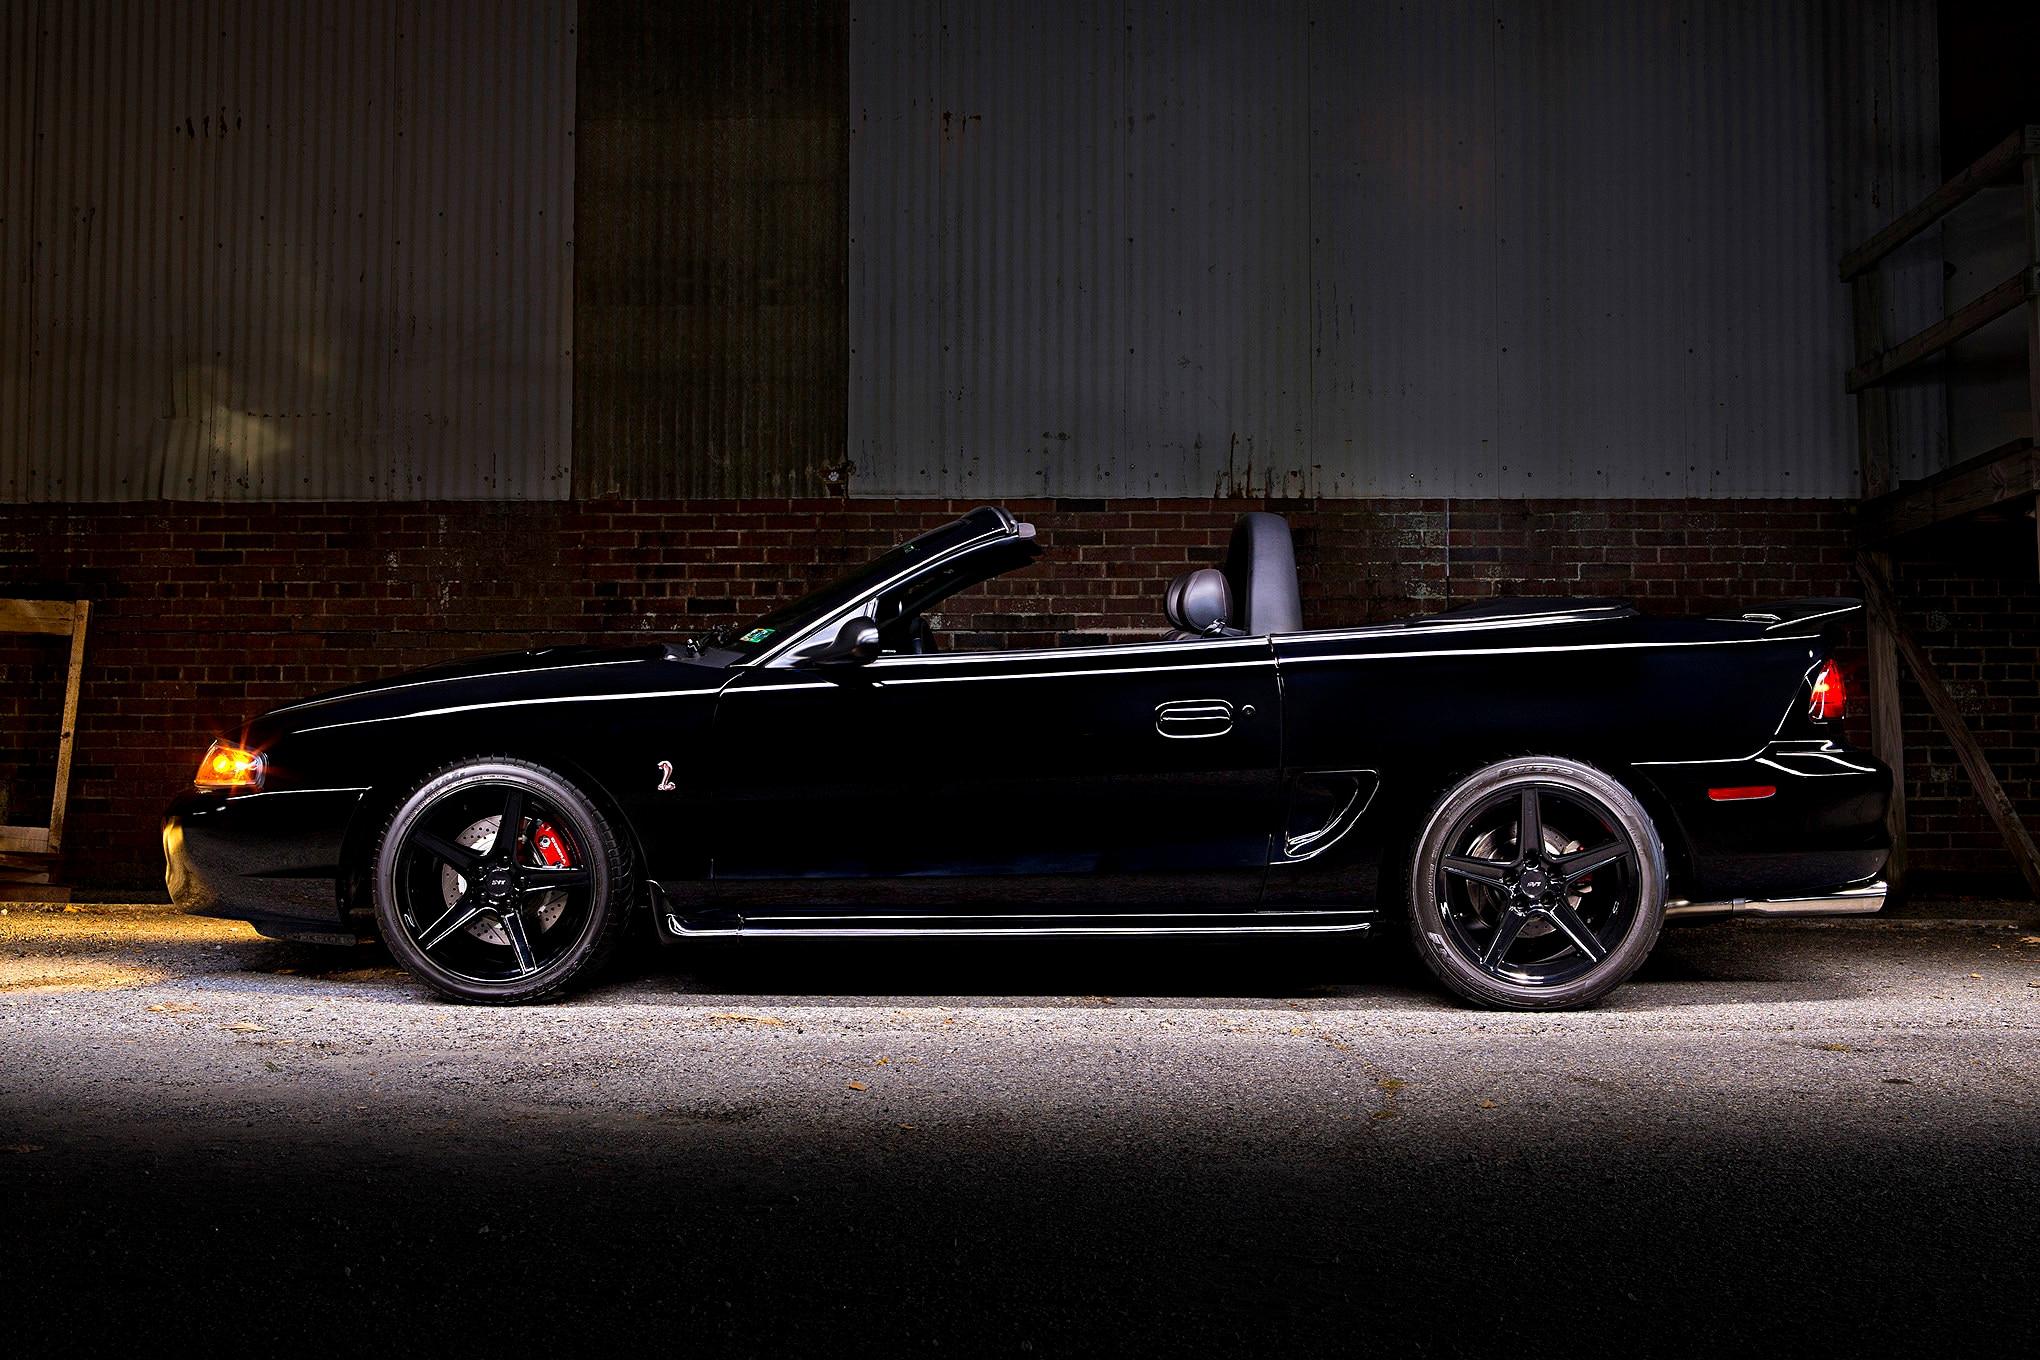 1998 Ford Mustang Cobra Side